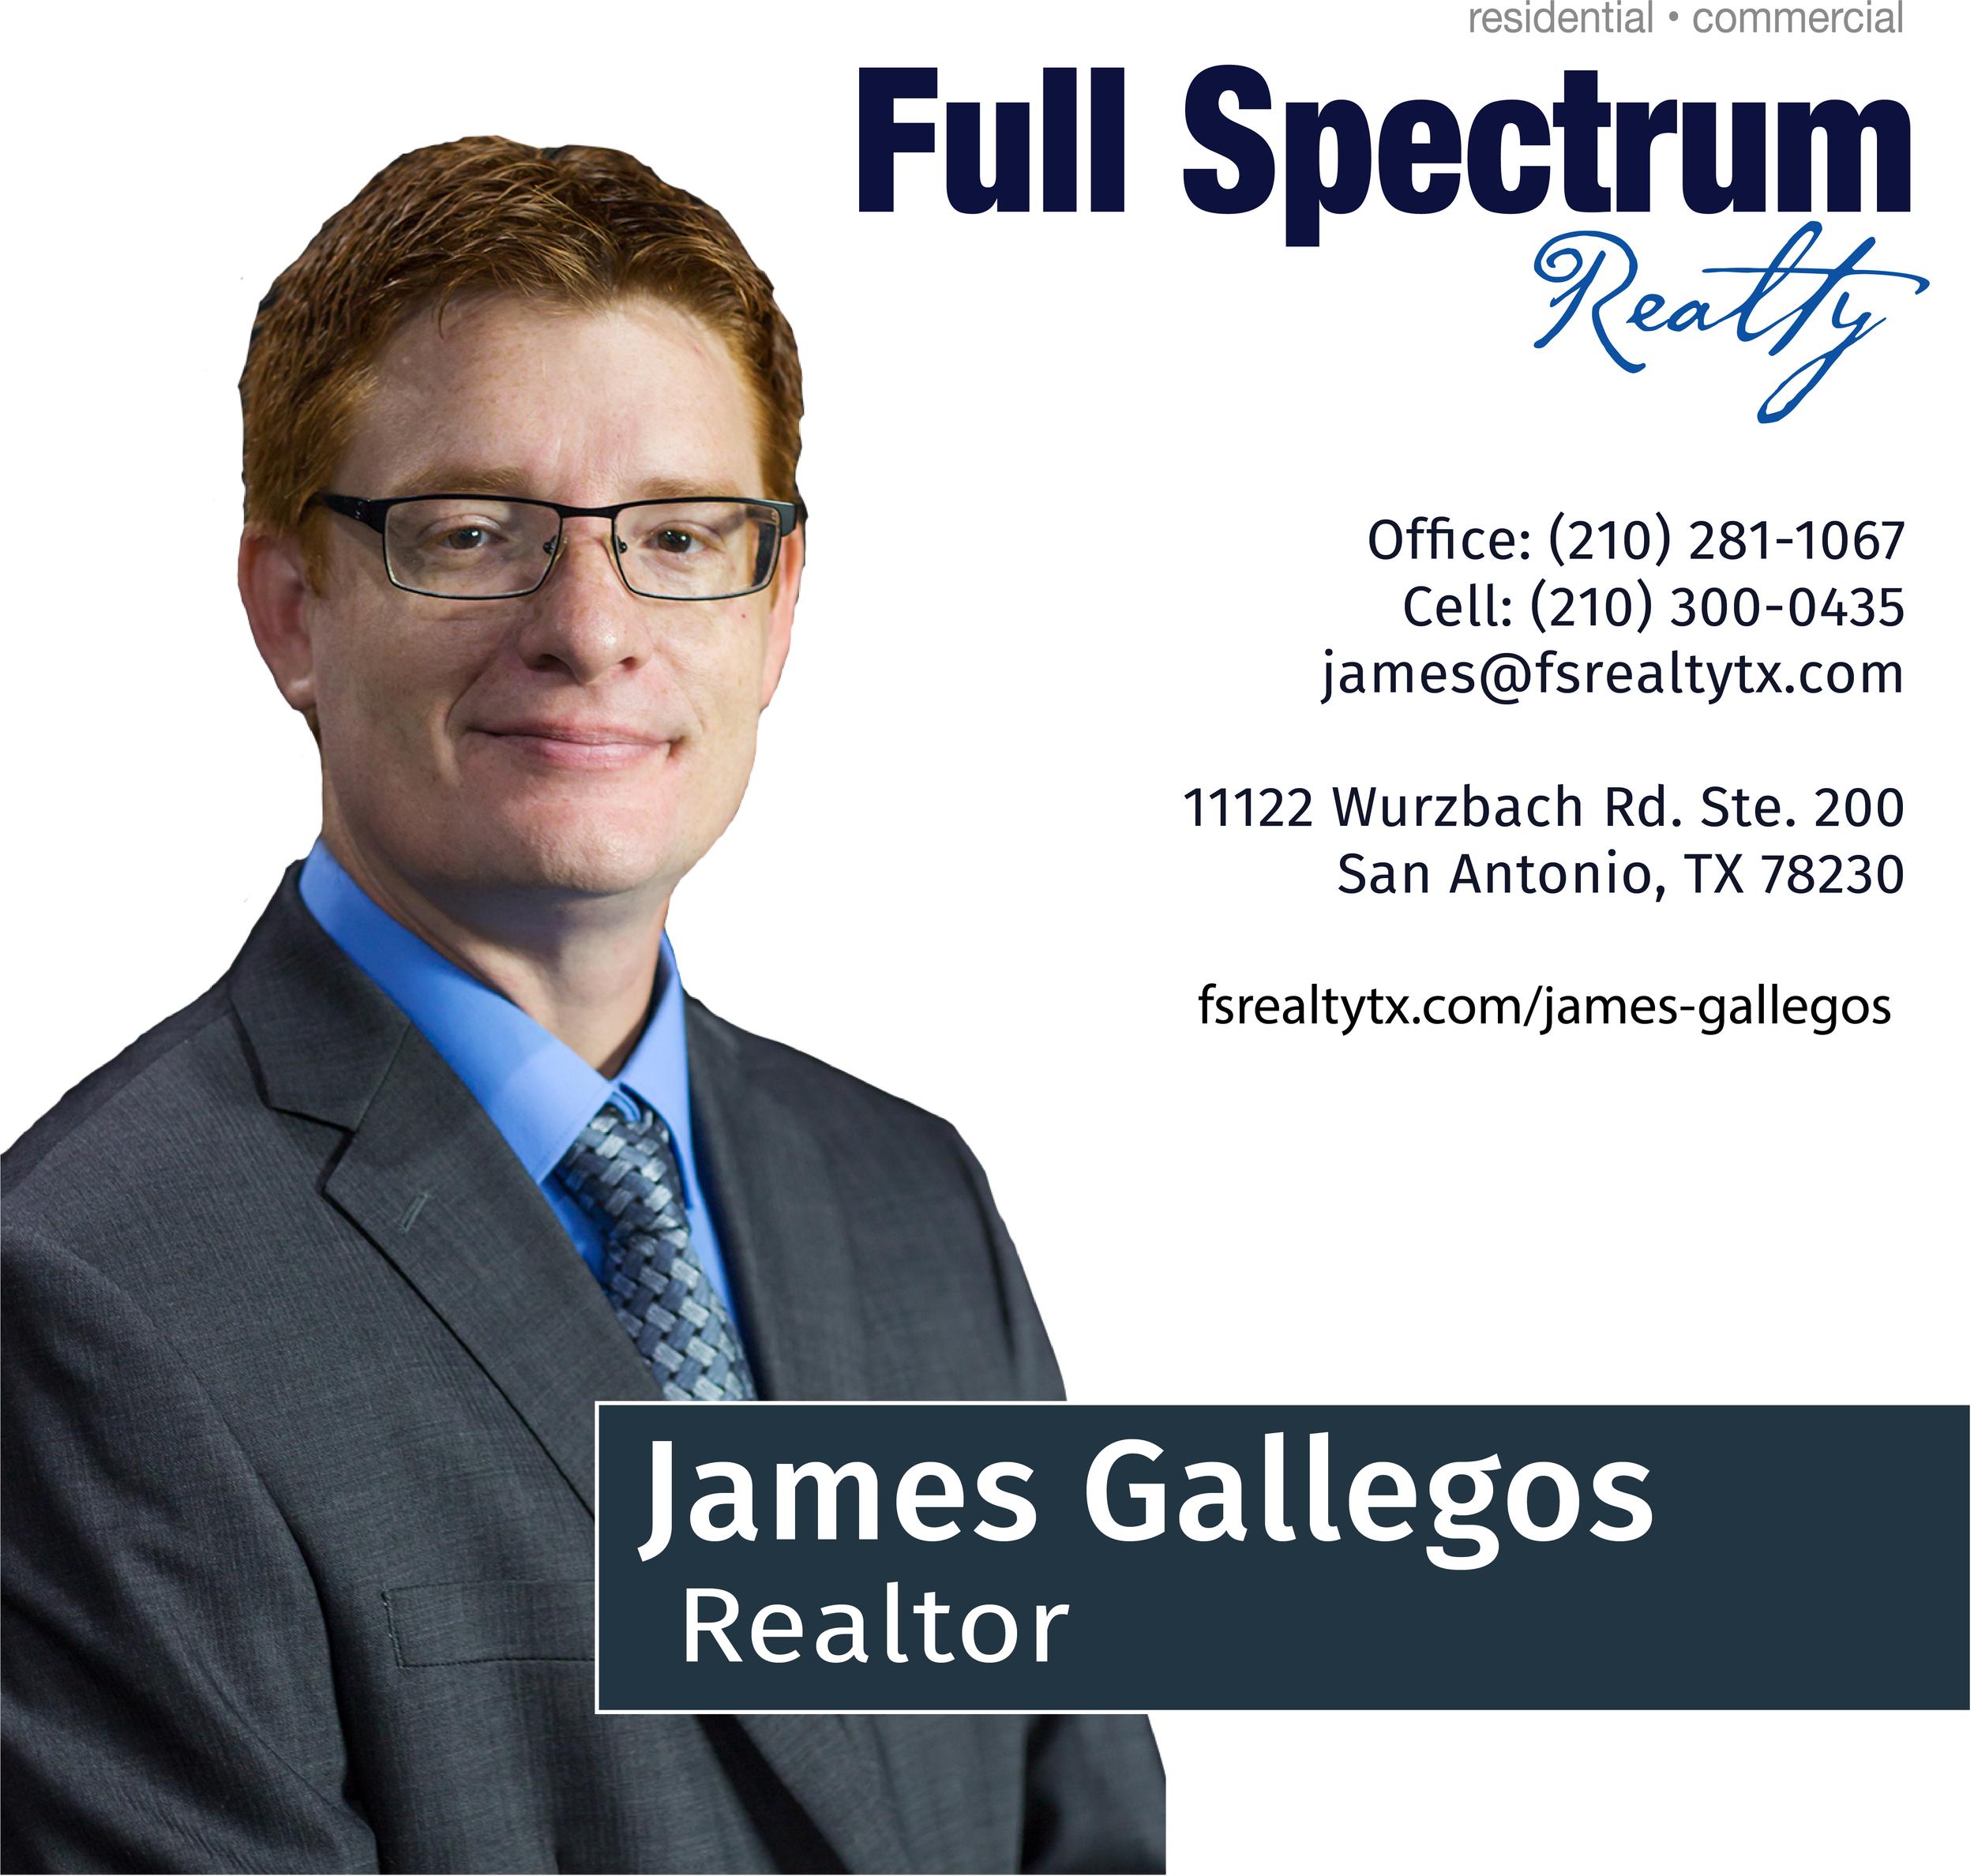 James gallegos.png